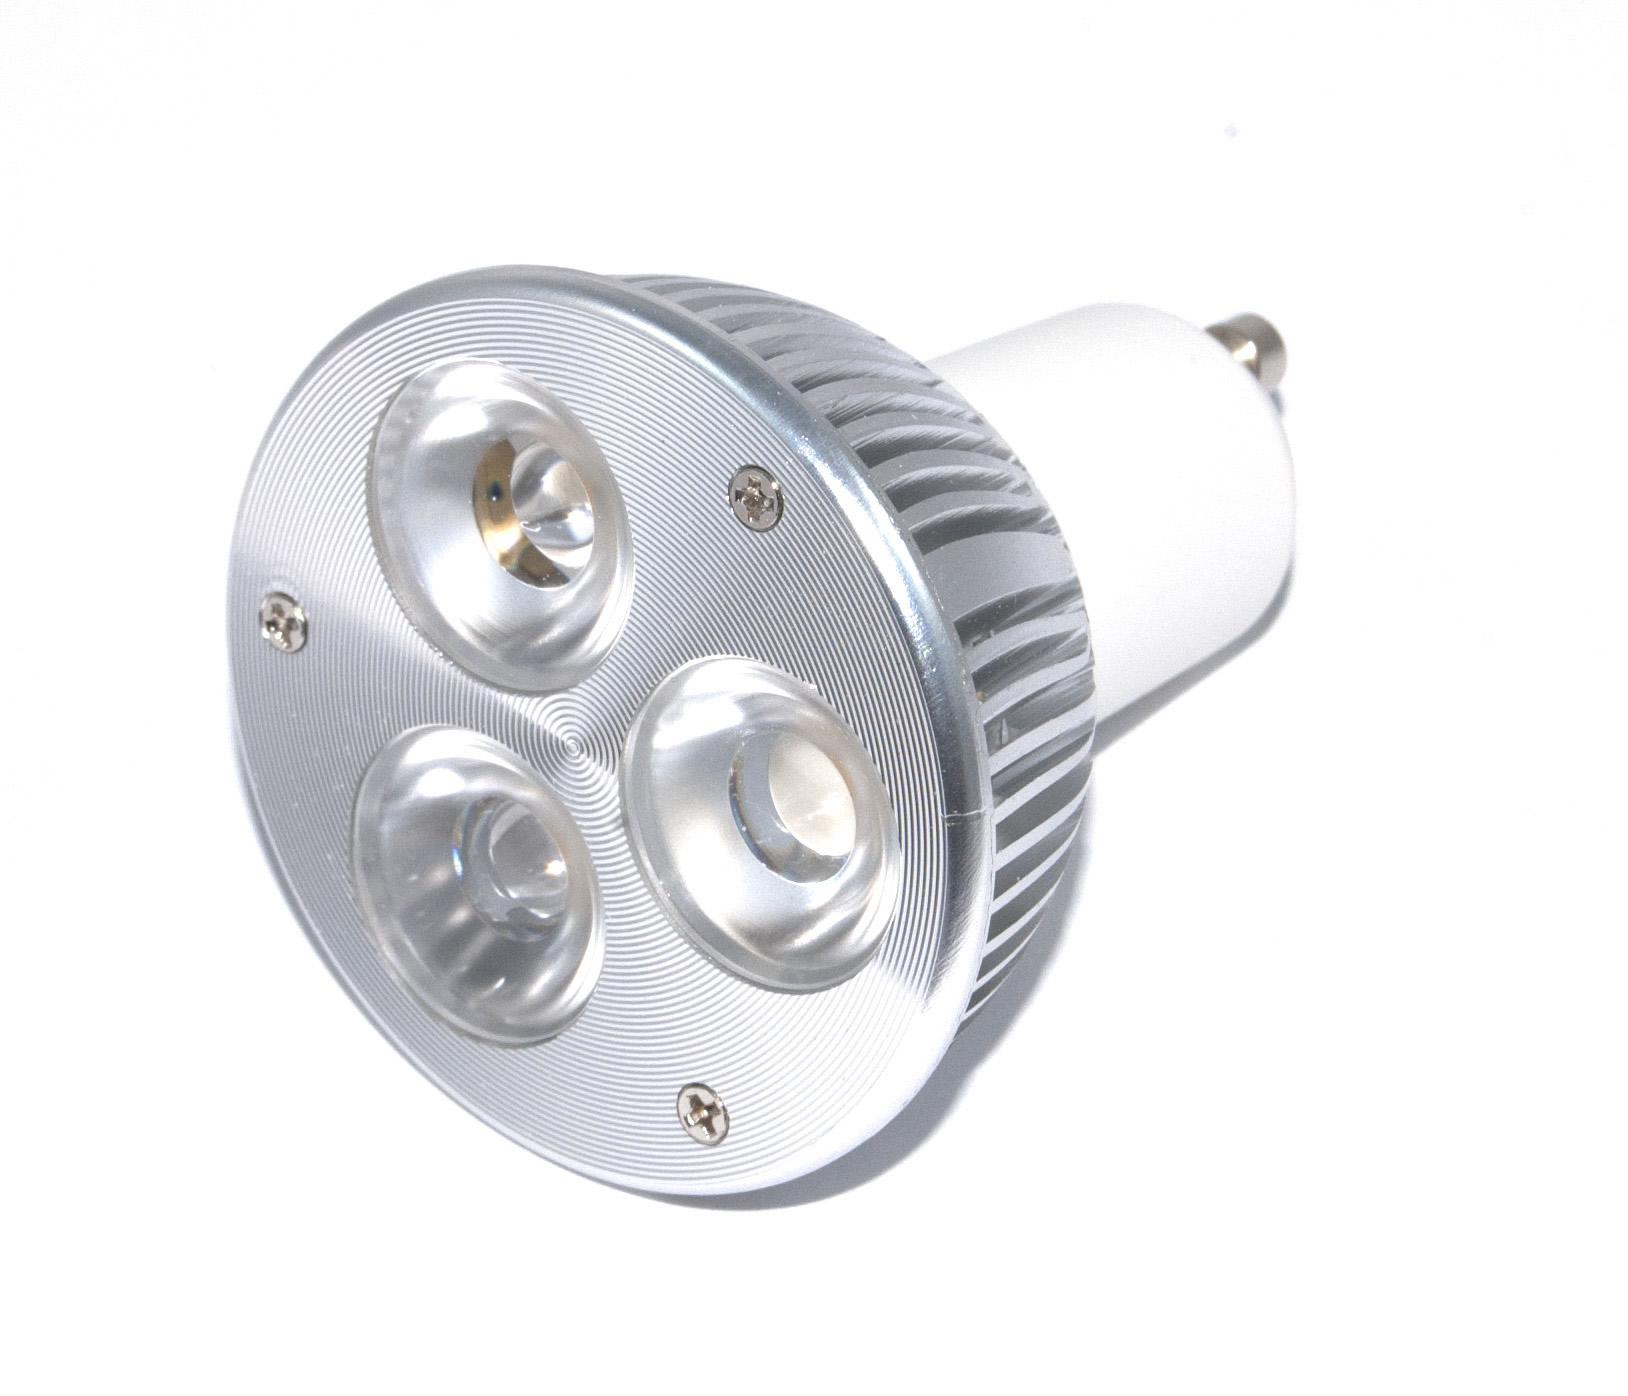 gu10 powerled cree 3x2w power led spot 6 watt warm wit 45 graden powerled verlichting. Black Bedroom Furniture Sets. Home Design Ideas